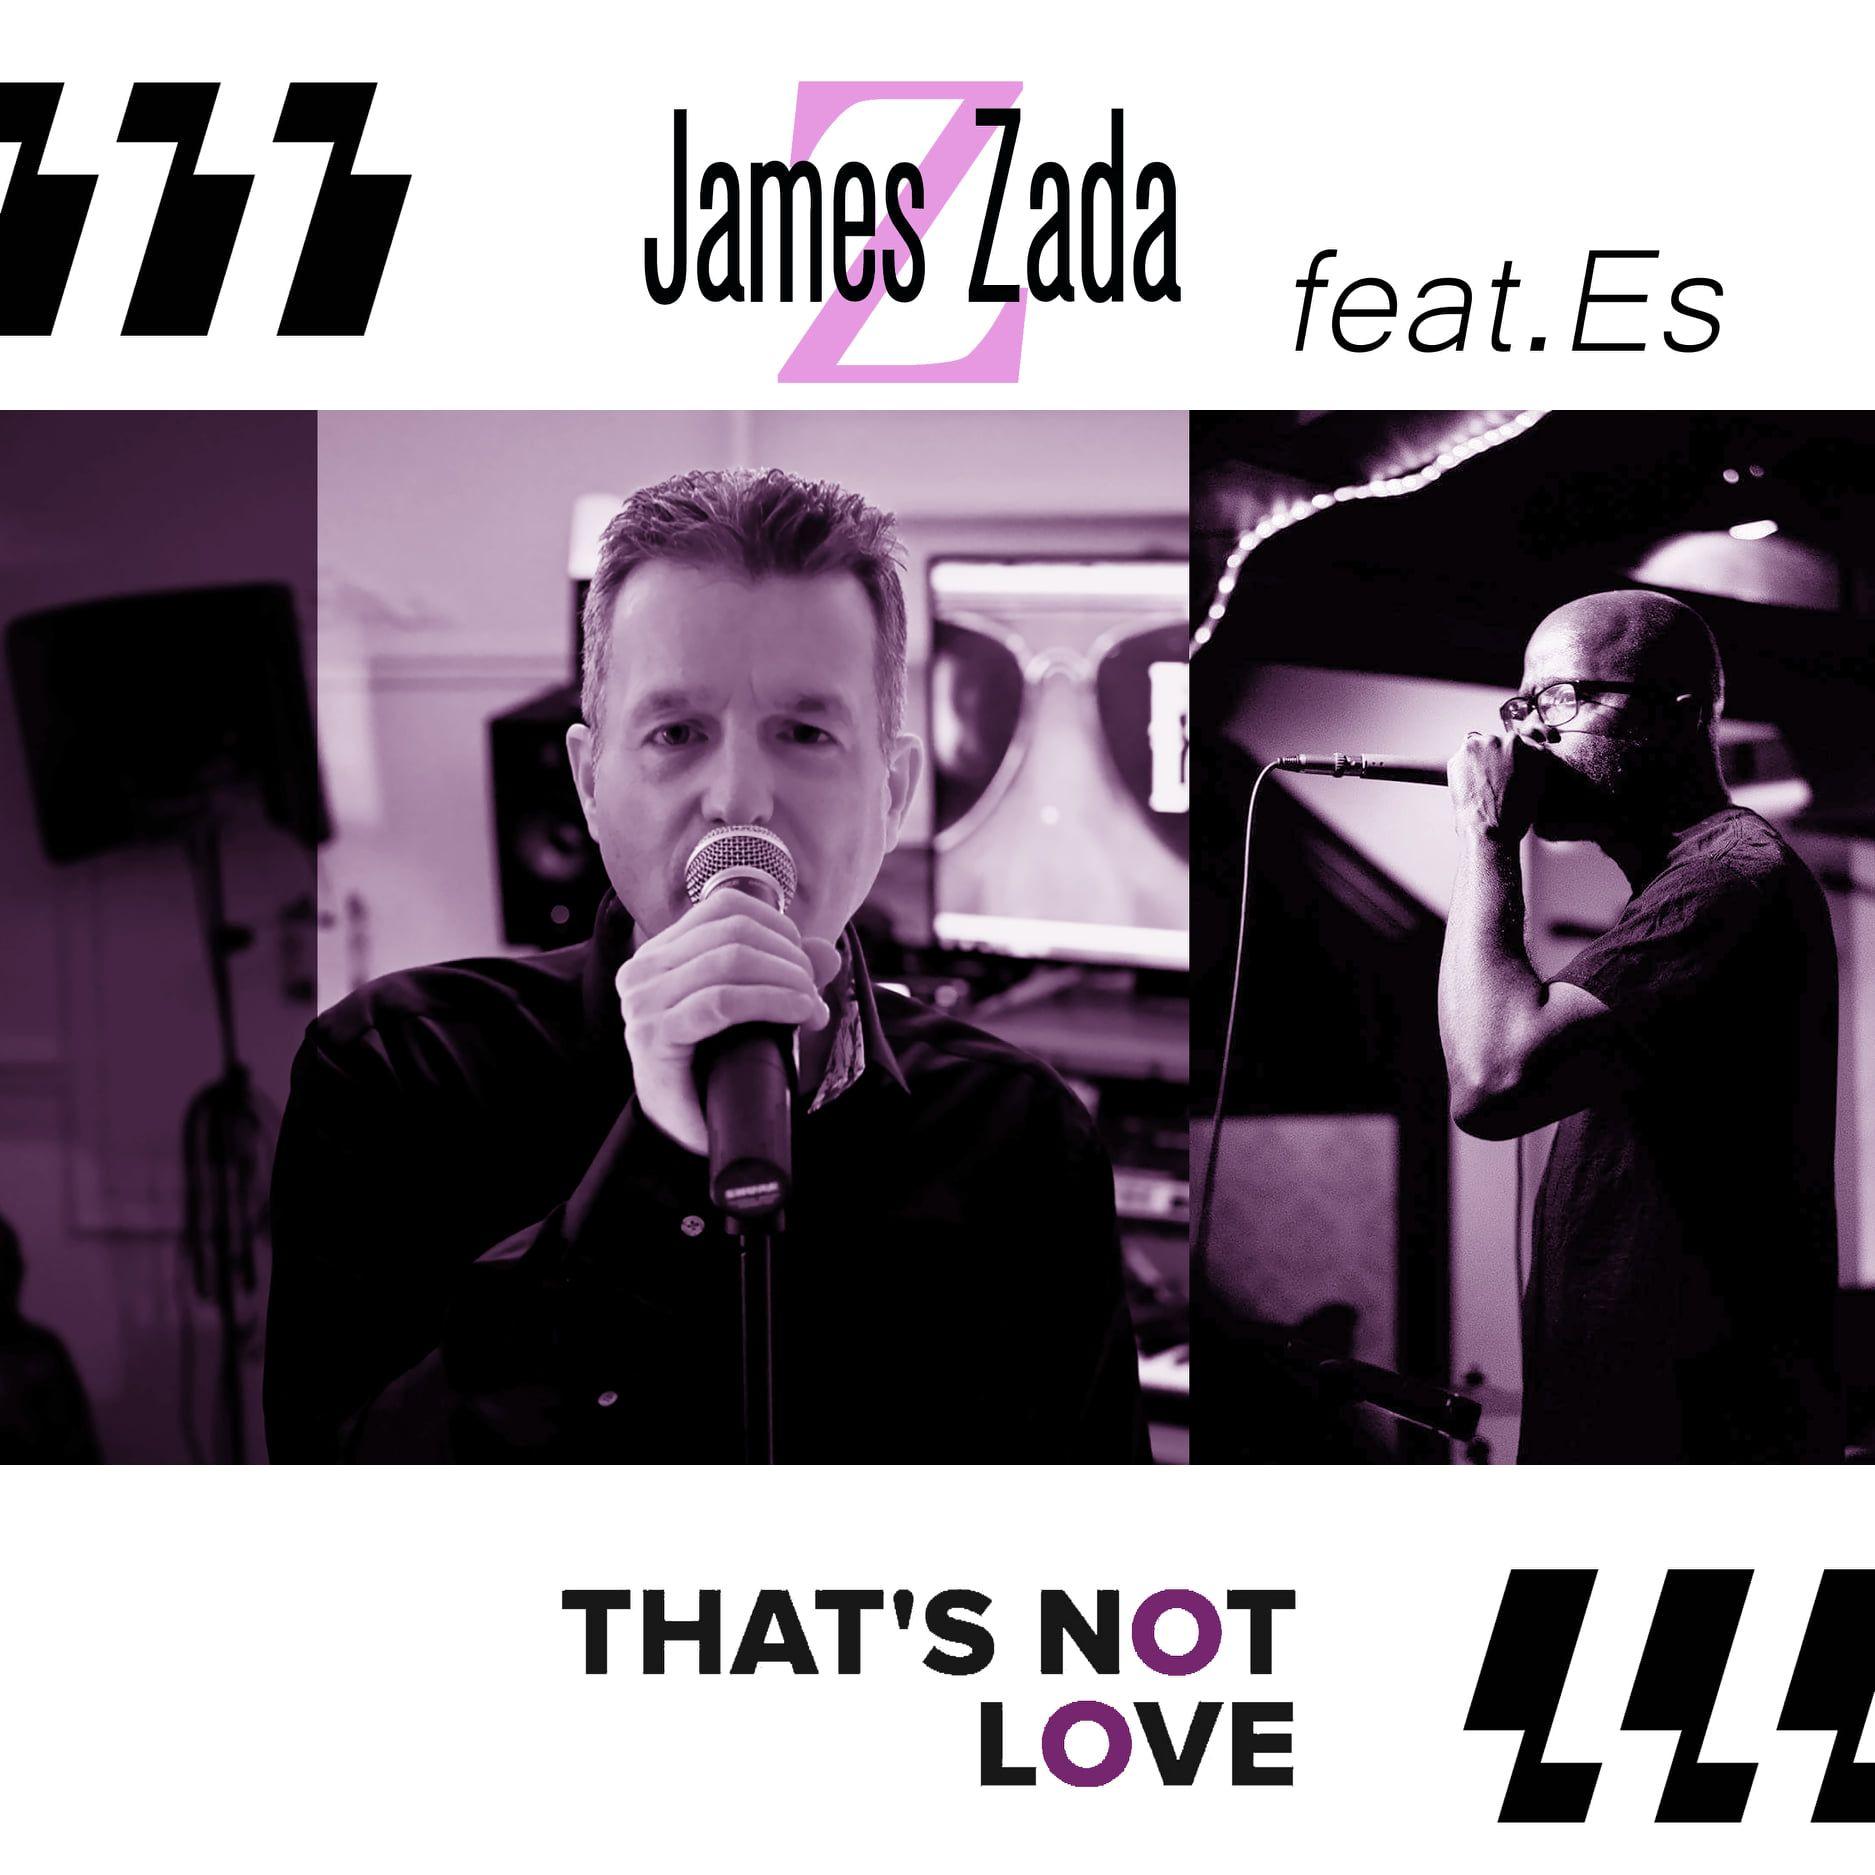 James Zada